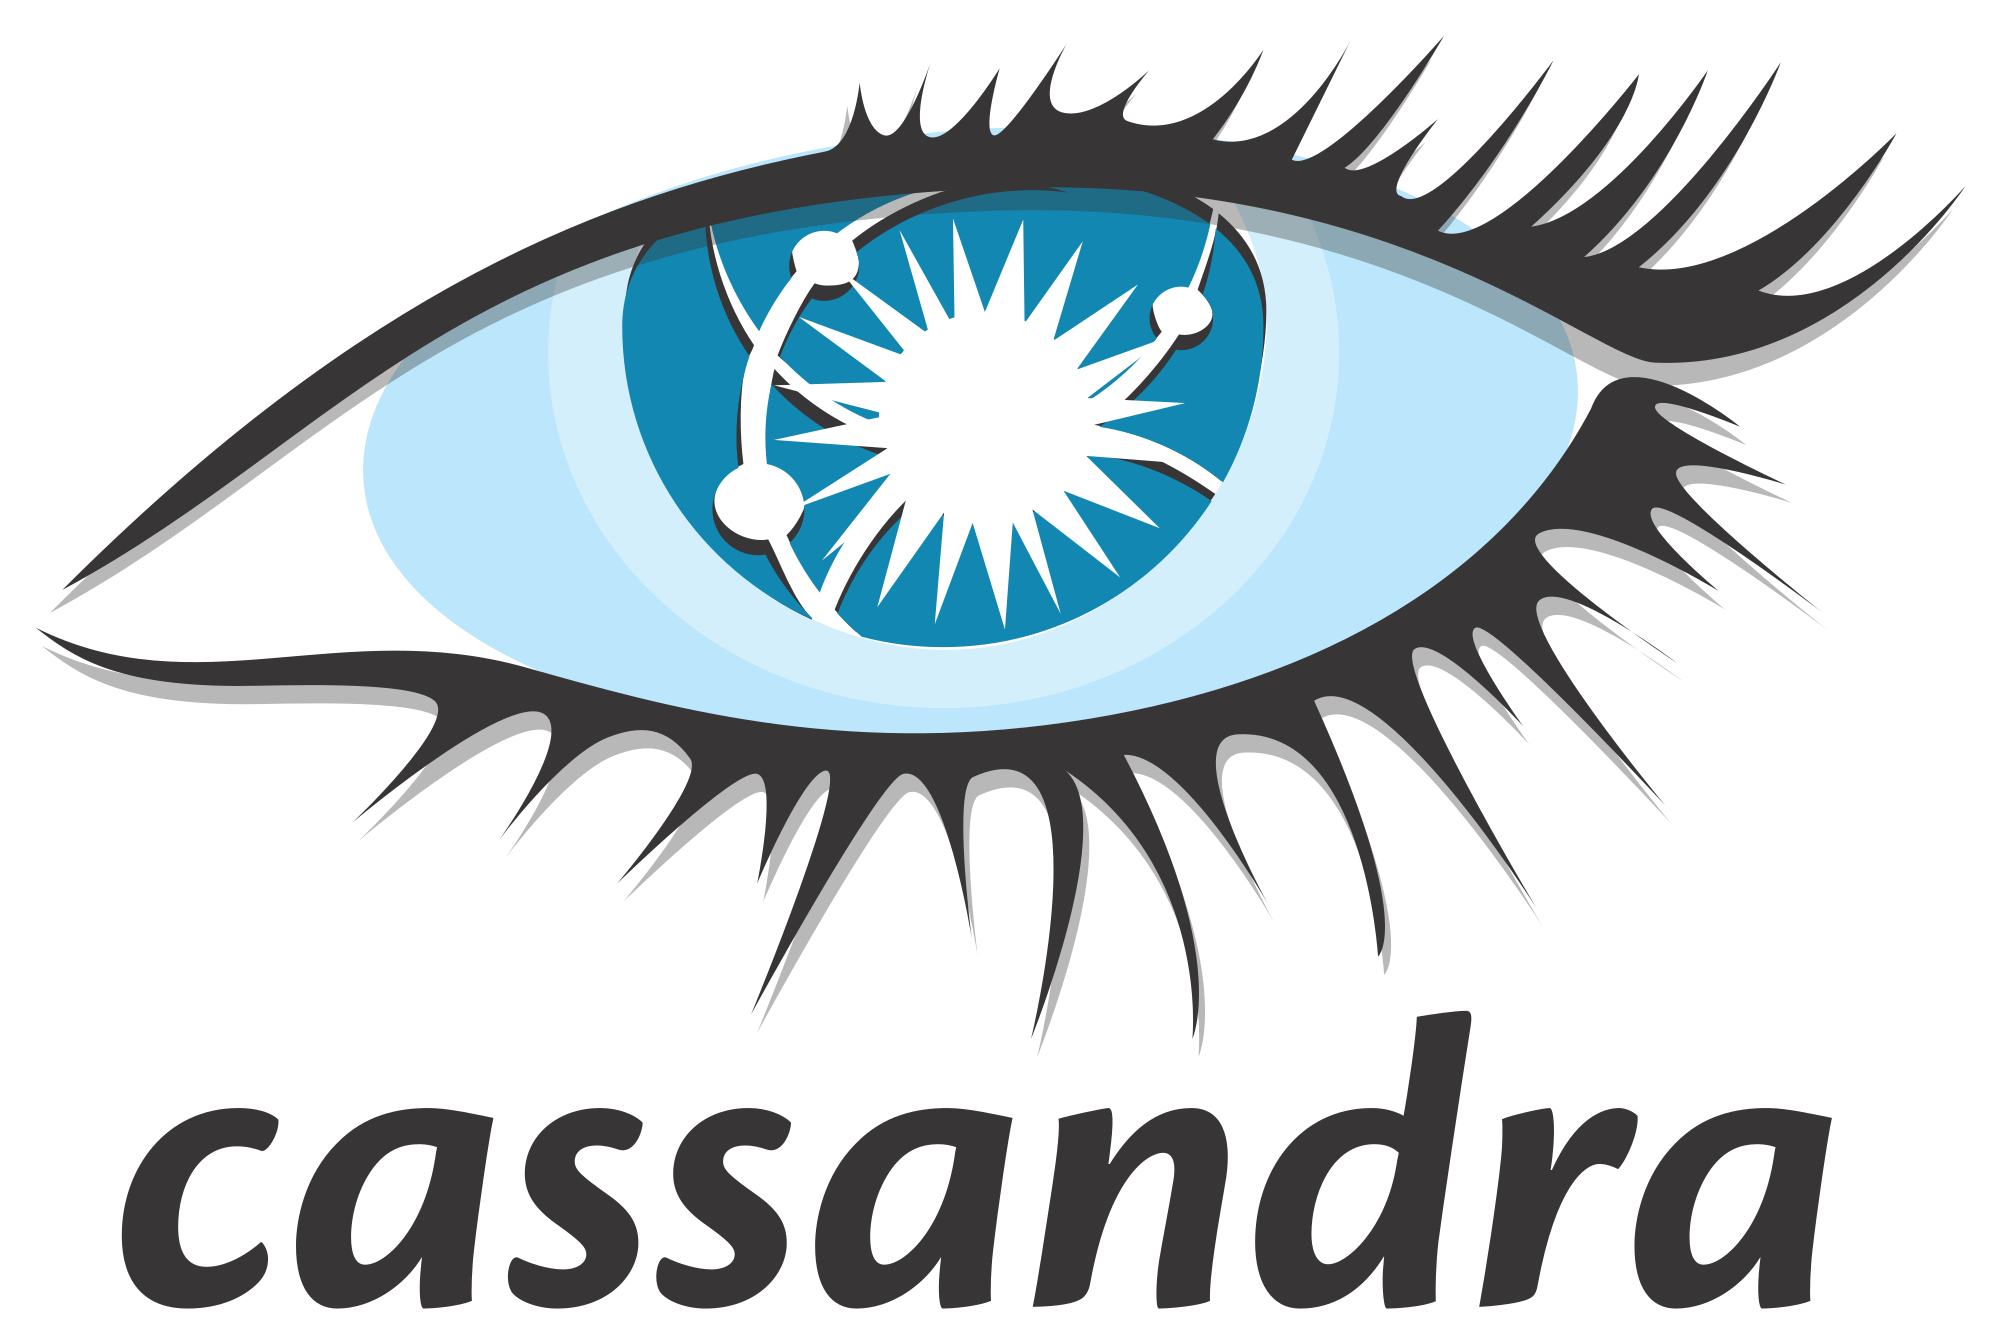 Eyelashes clipart file. Monitoring cassandra health and